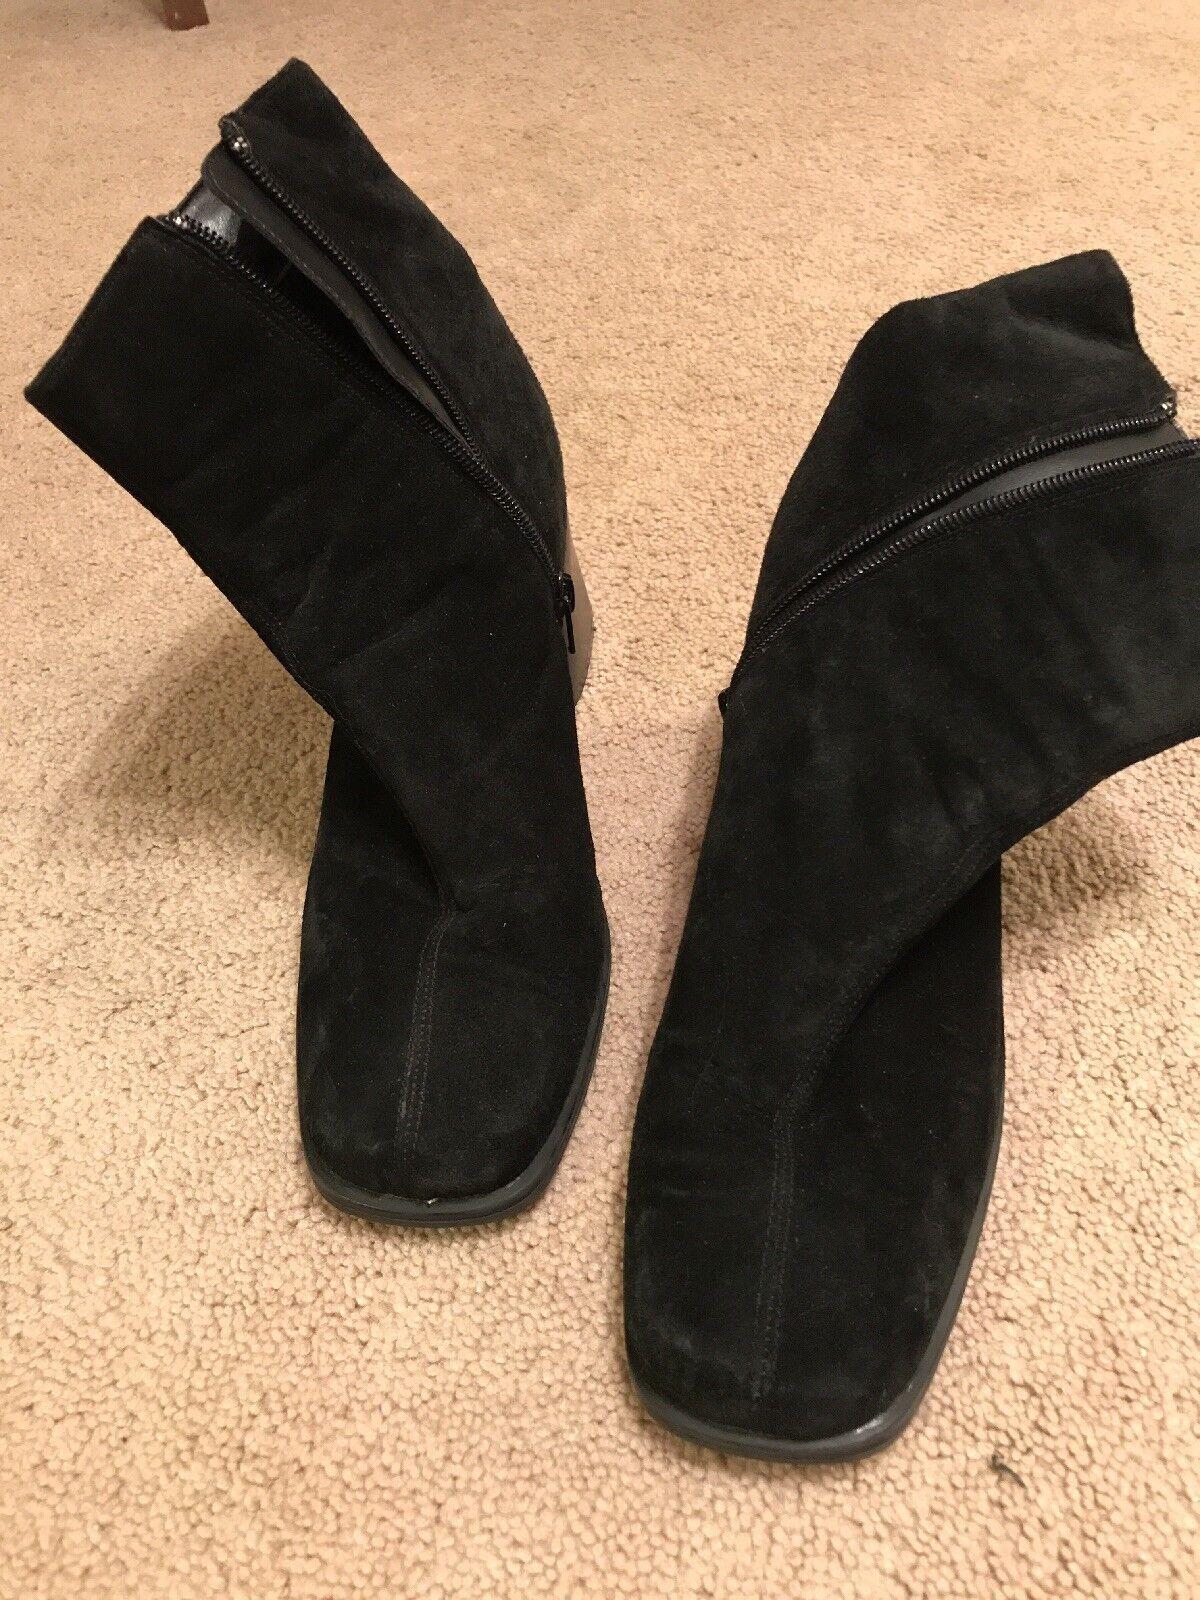 Fanfares Suede Heel Boot Black Size 9.